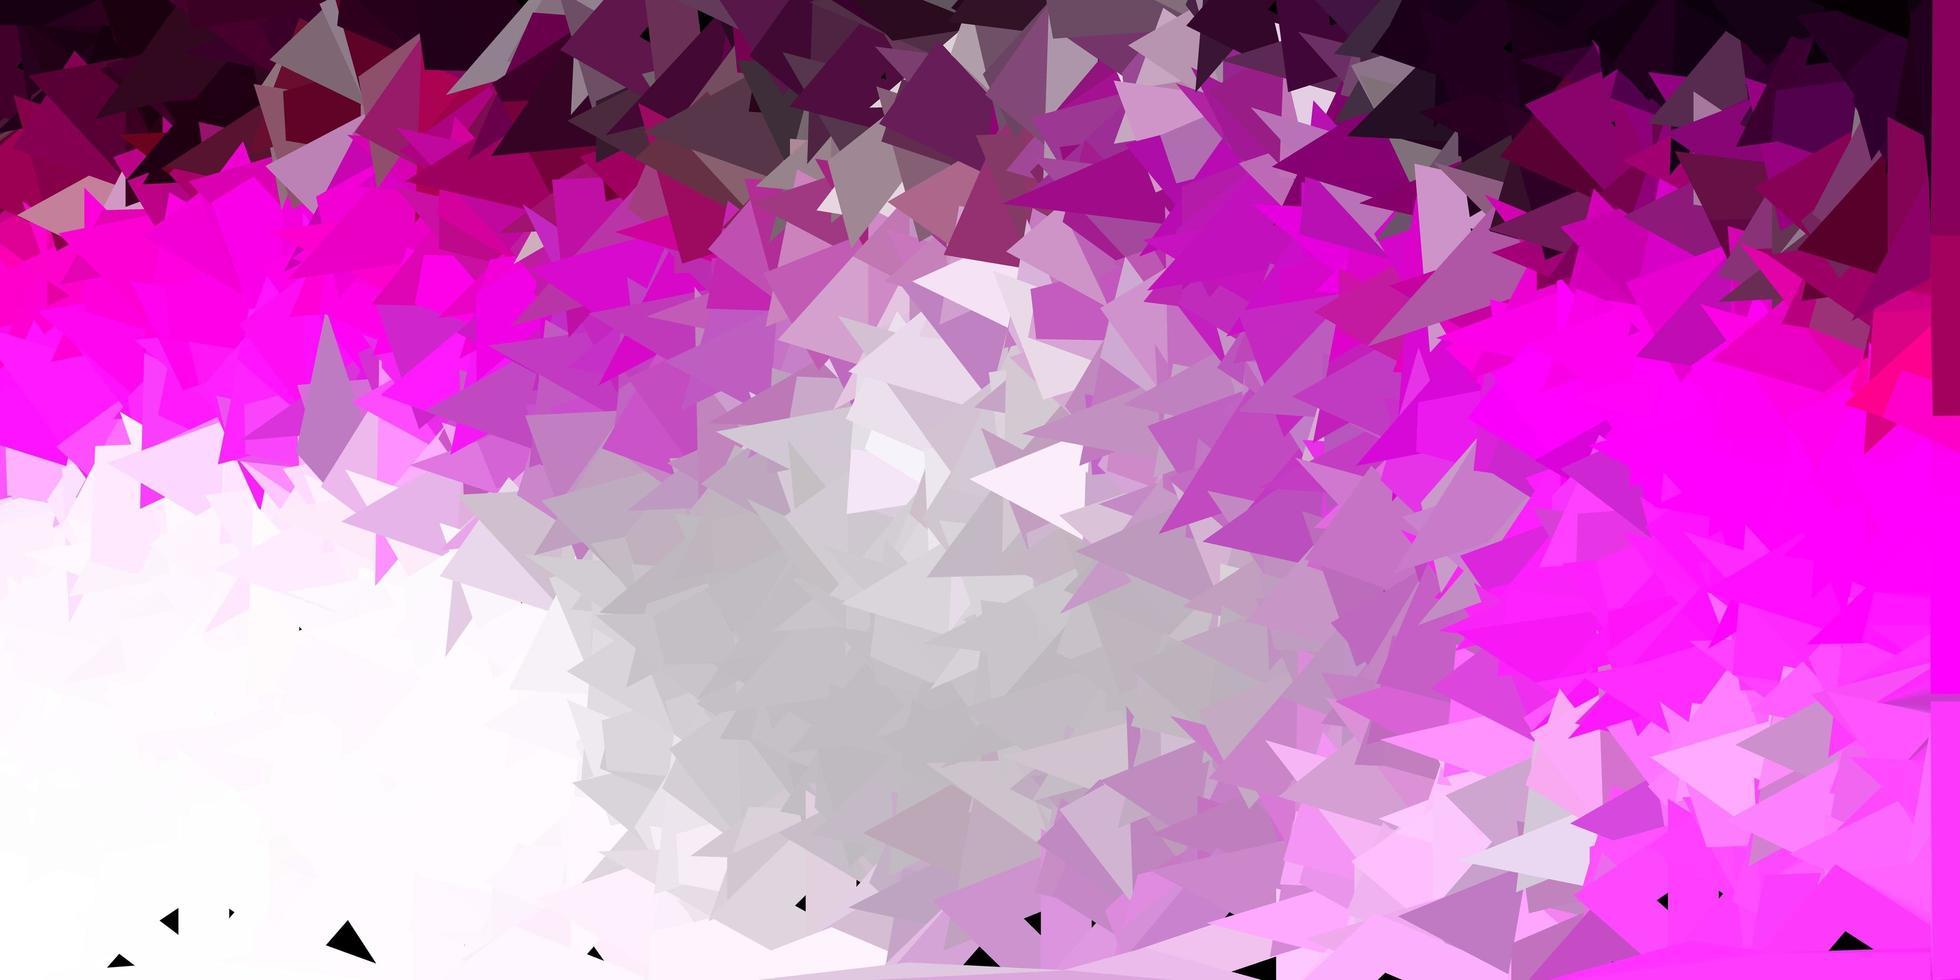 hellrosa Vektor-Gradienten-Polygon-Design. vektor